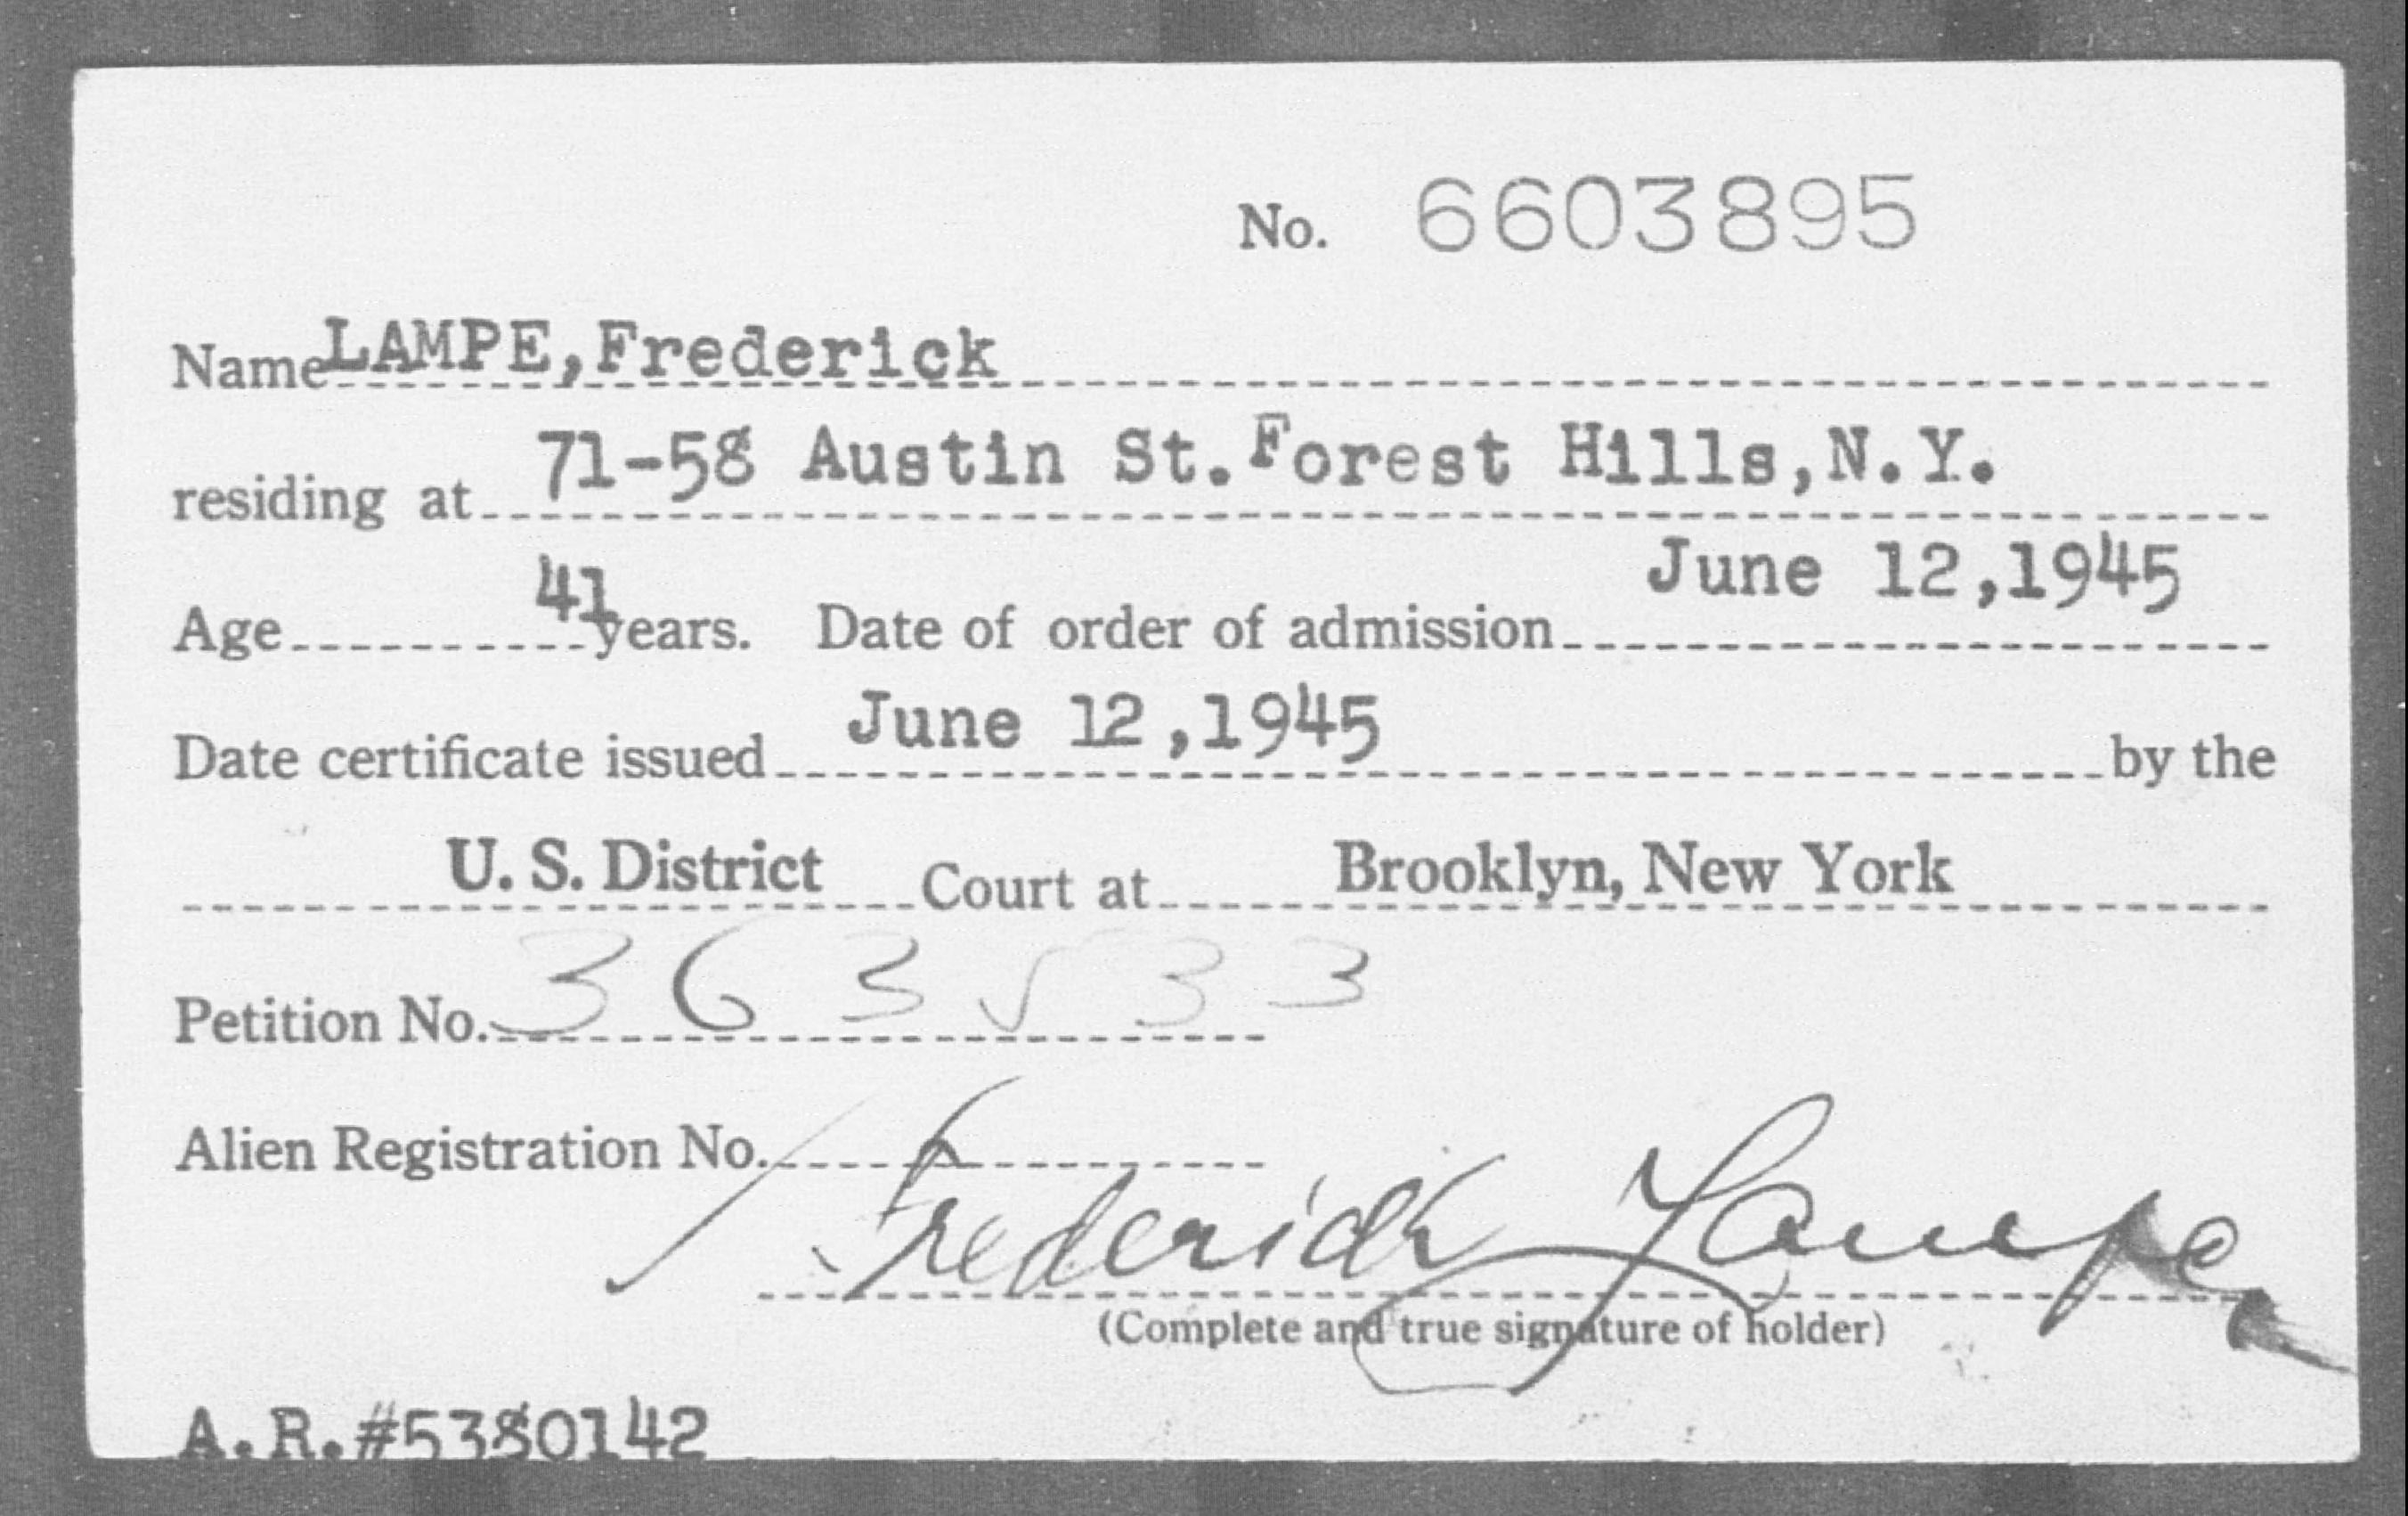 Lampe, Frederick - Born: [BLANK], Naturalized: 1945